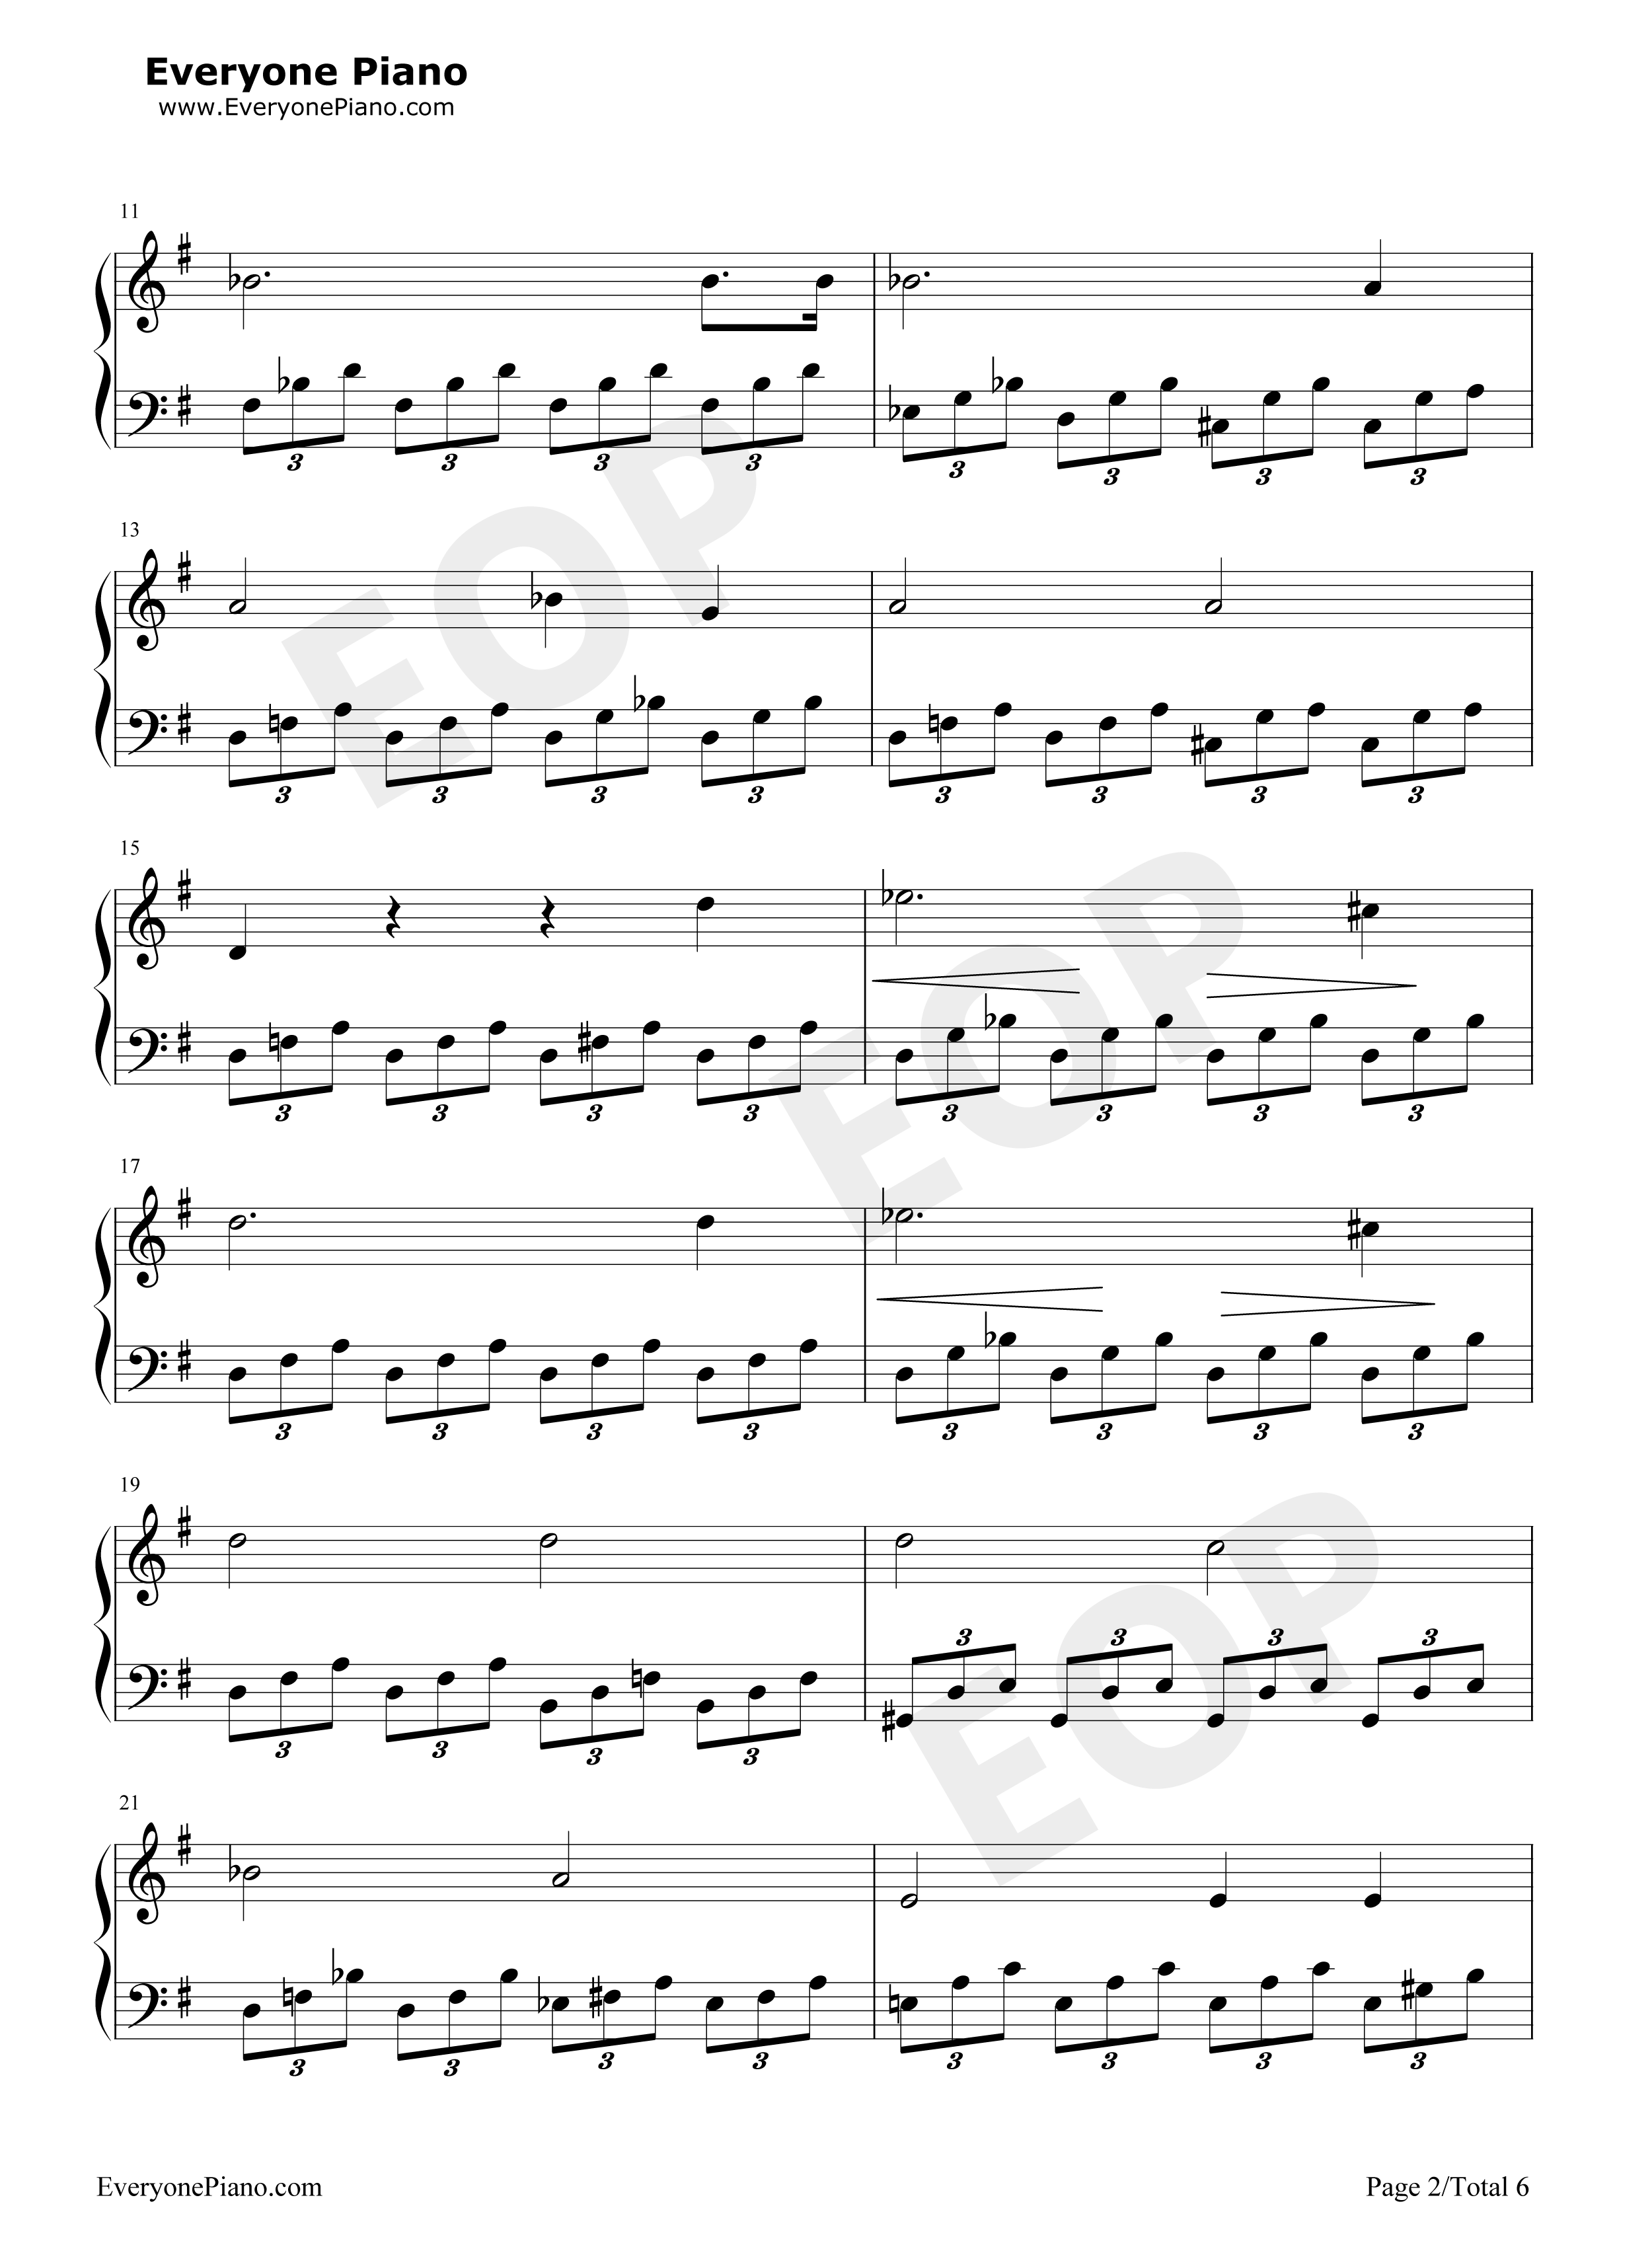 Moonlight Sonata Stave Preview 2-Free Piano Sheet Music u0026 Piano Chords